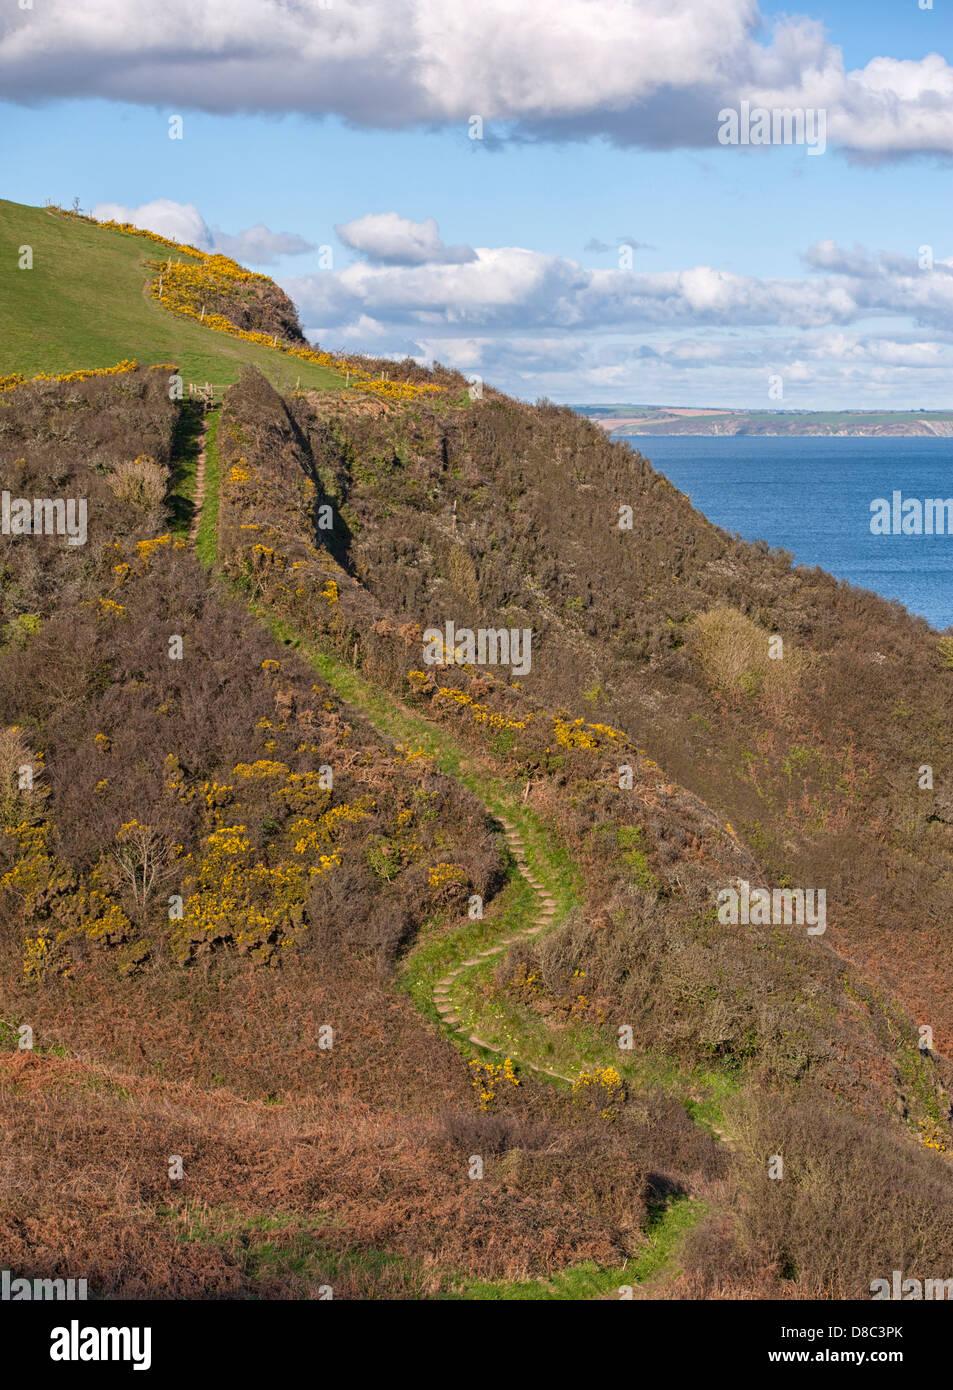 Winding path on sunny coastal hill in Dorset - Stock Image